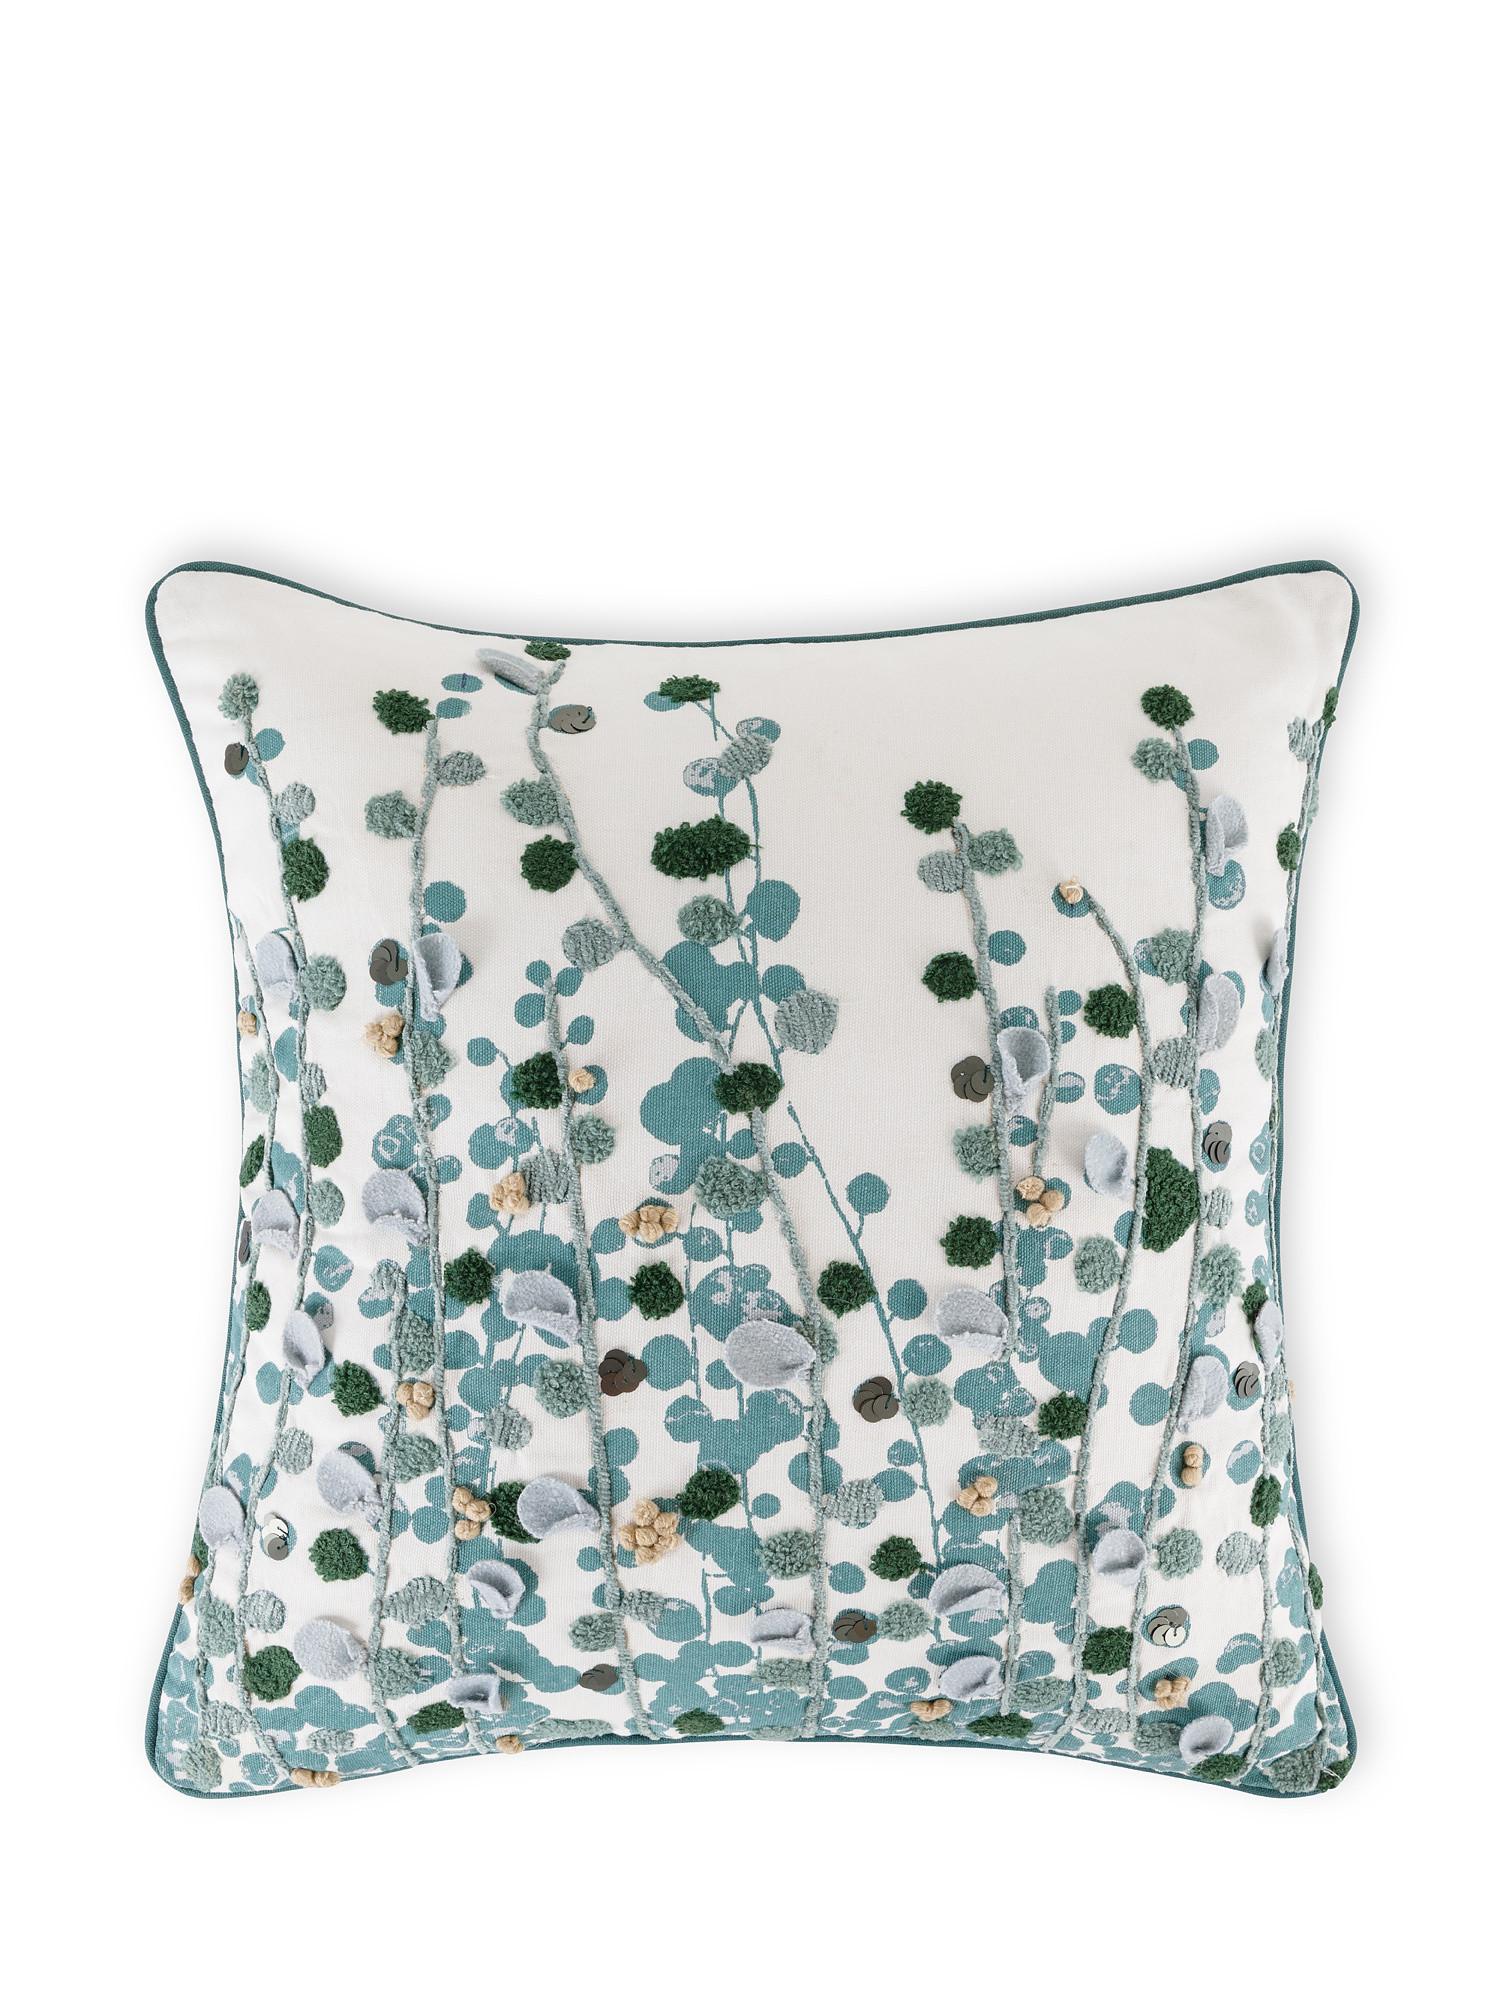 Cuscino cotone ricamo eucalipto 45x45cm, Multicolor, large image number 0